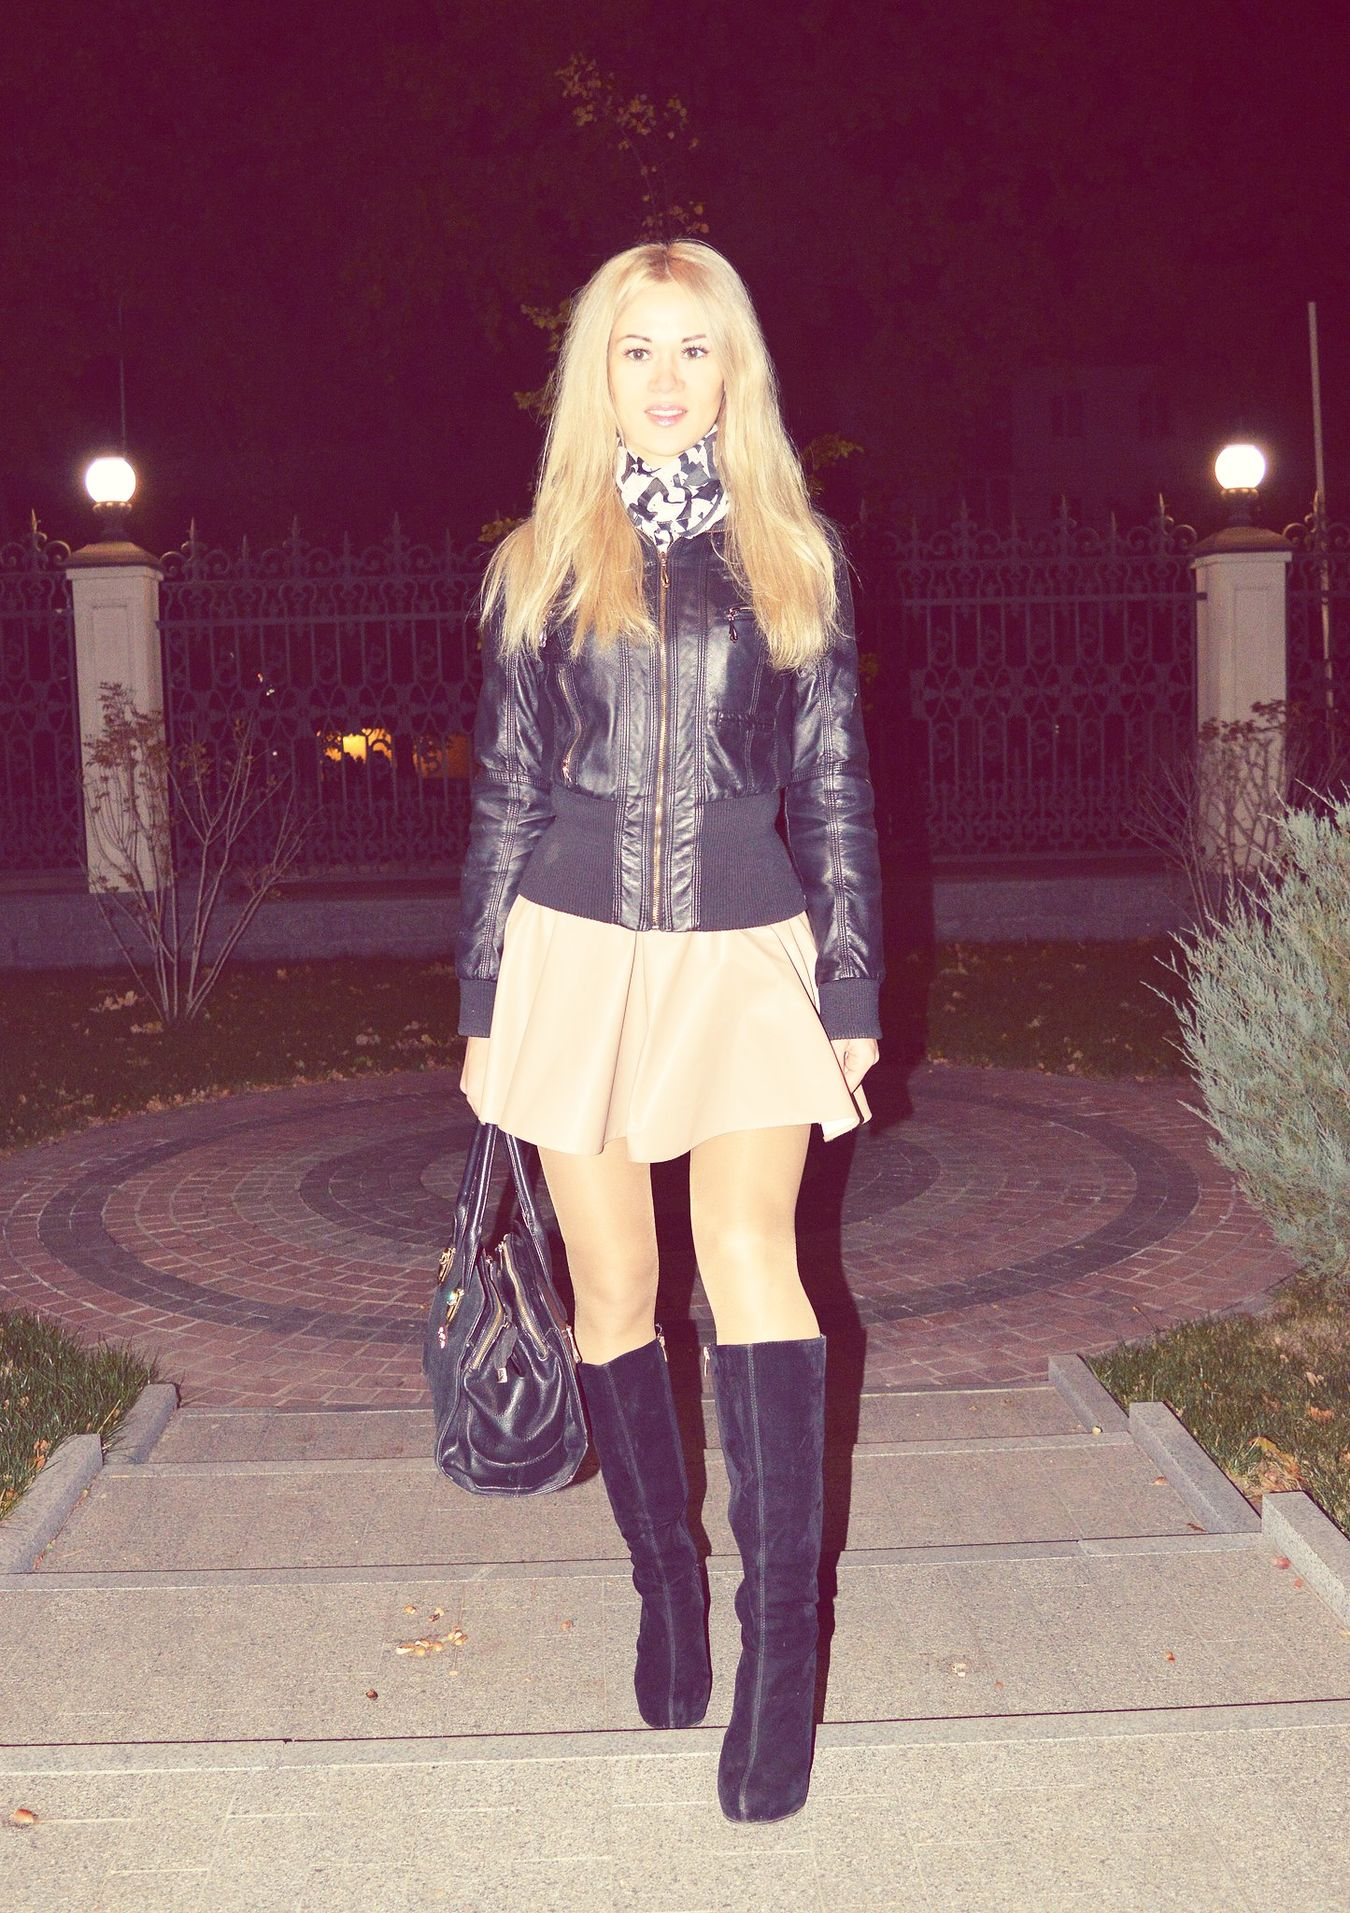 Mygirl♥ Barbie Girl Myblondie Beautiful Girl Gorlovka